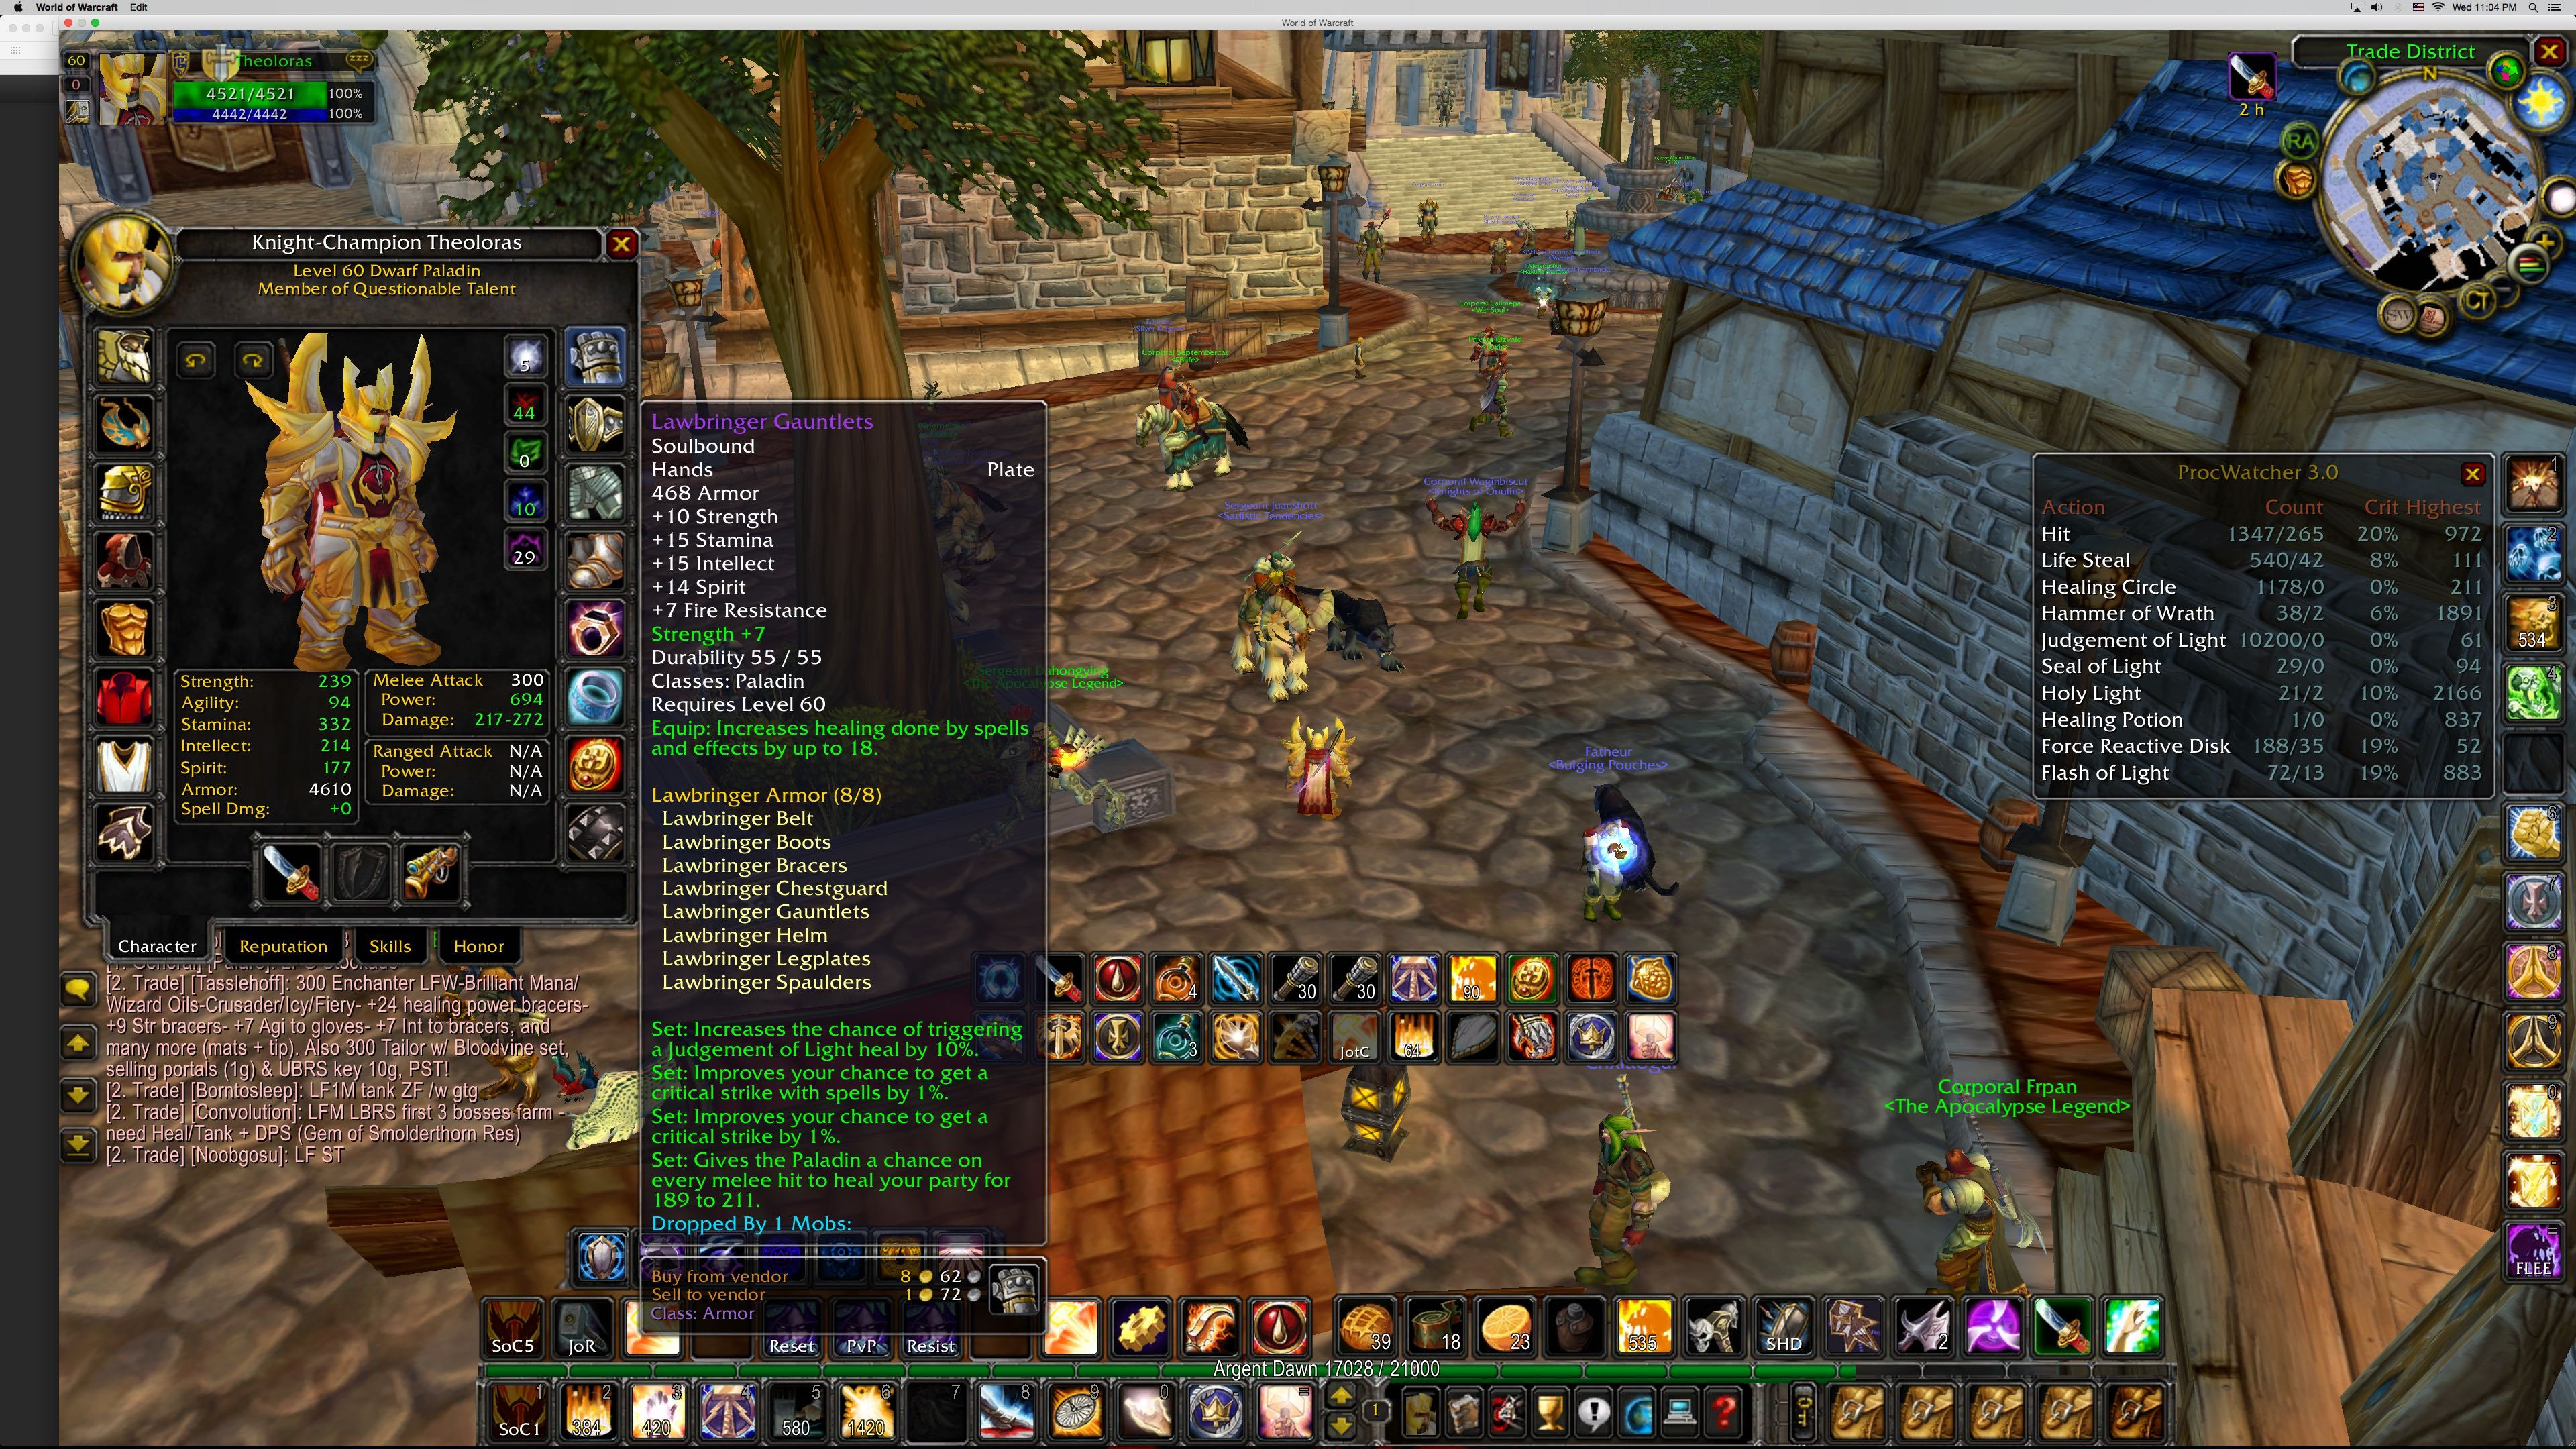 Prot Paladins don't need balancing - World of Warcraft Forums